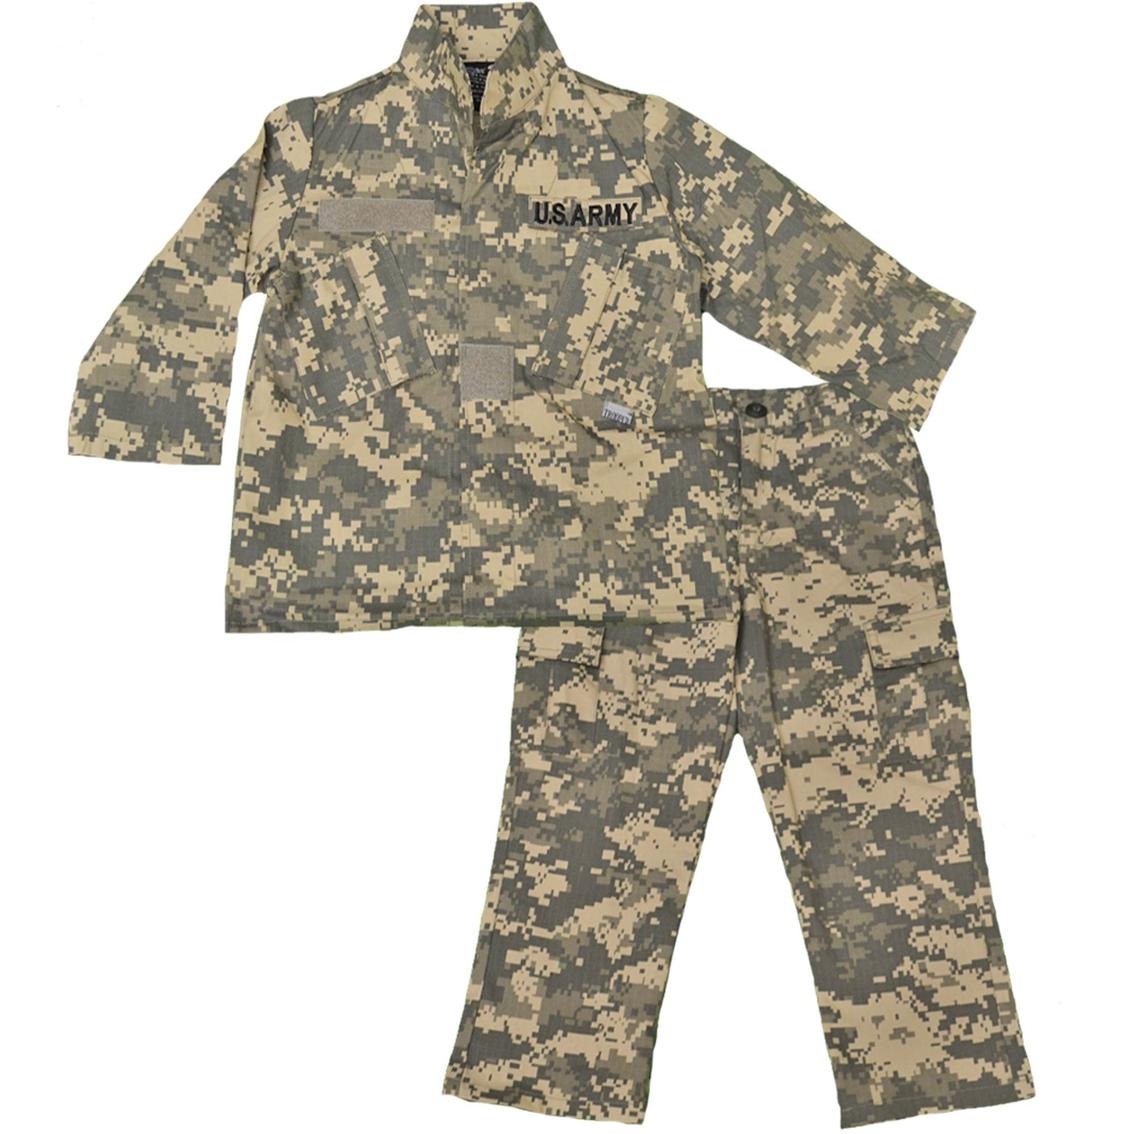 Trooper Clothing Little Boys Boys Acu Army Camouflage